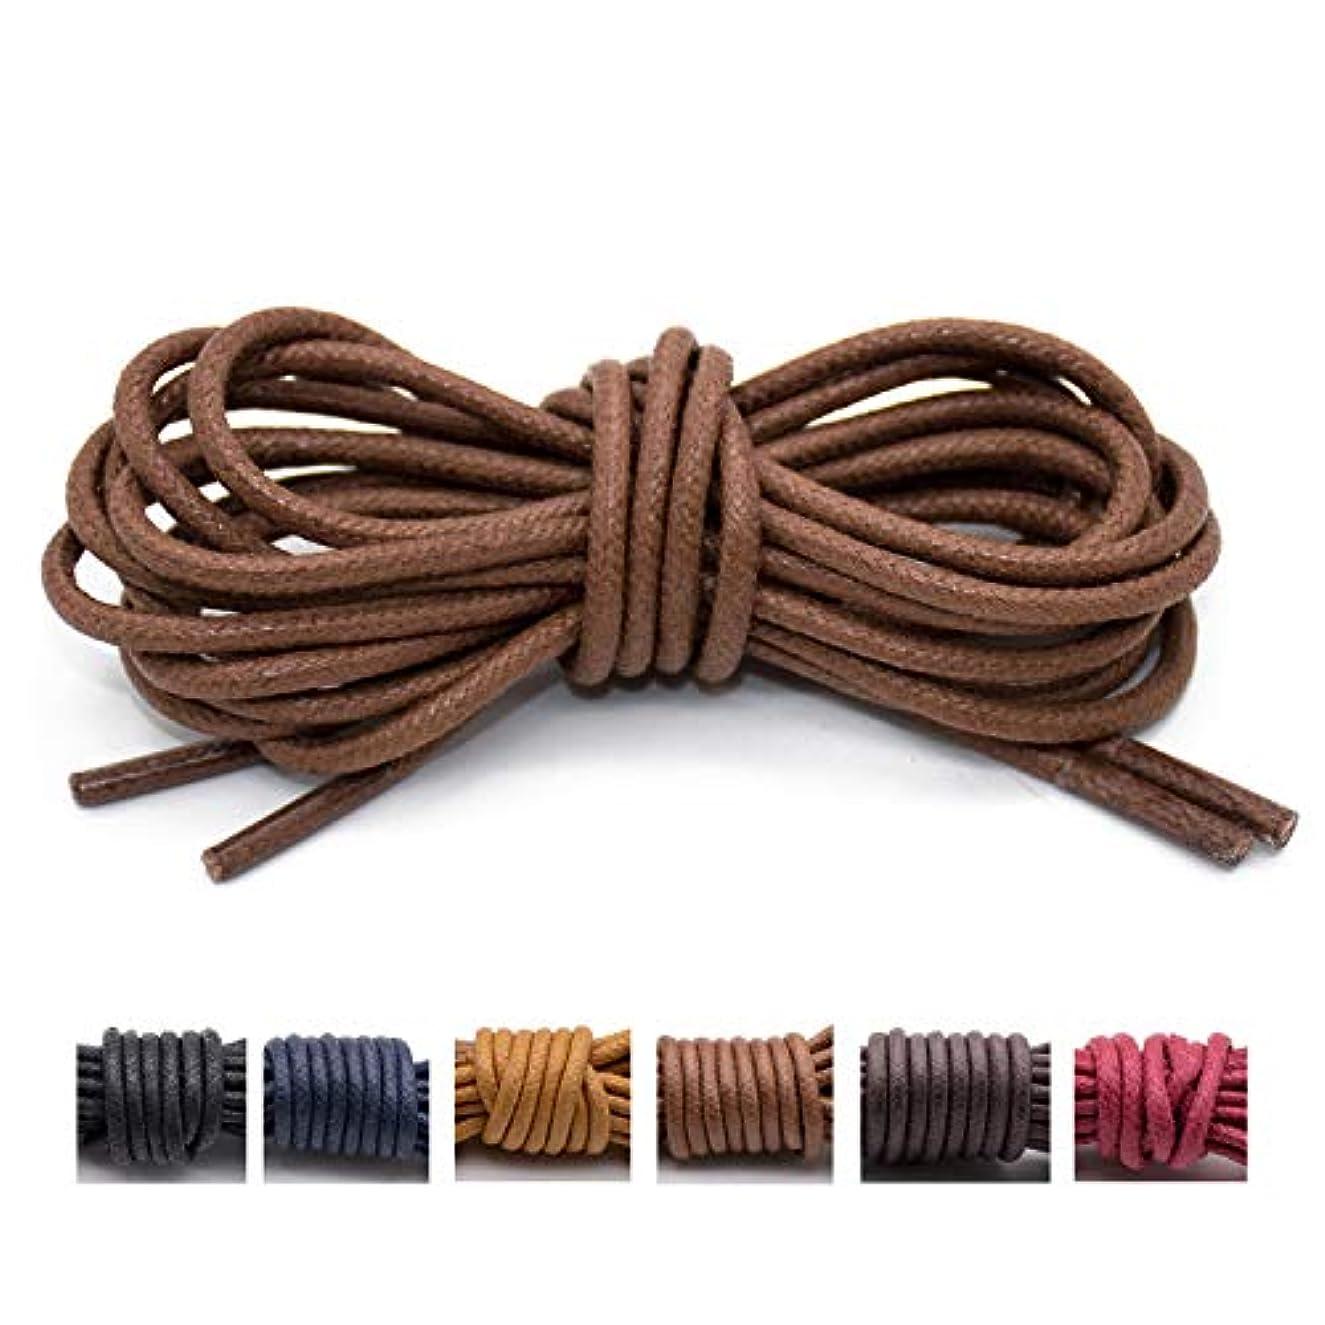 Handshop Waxed Boot Shoelaces, Cotton Round Shoe Laces for Dress Shoes